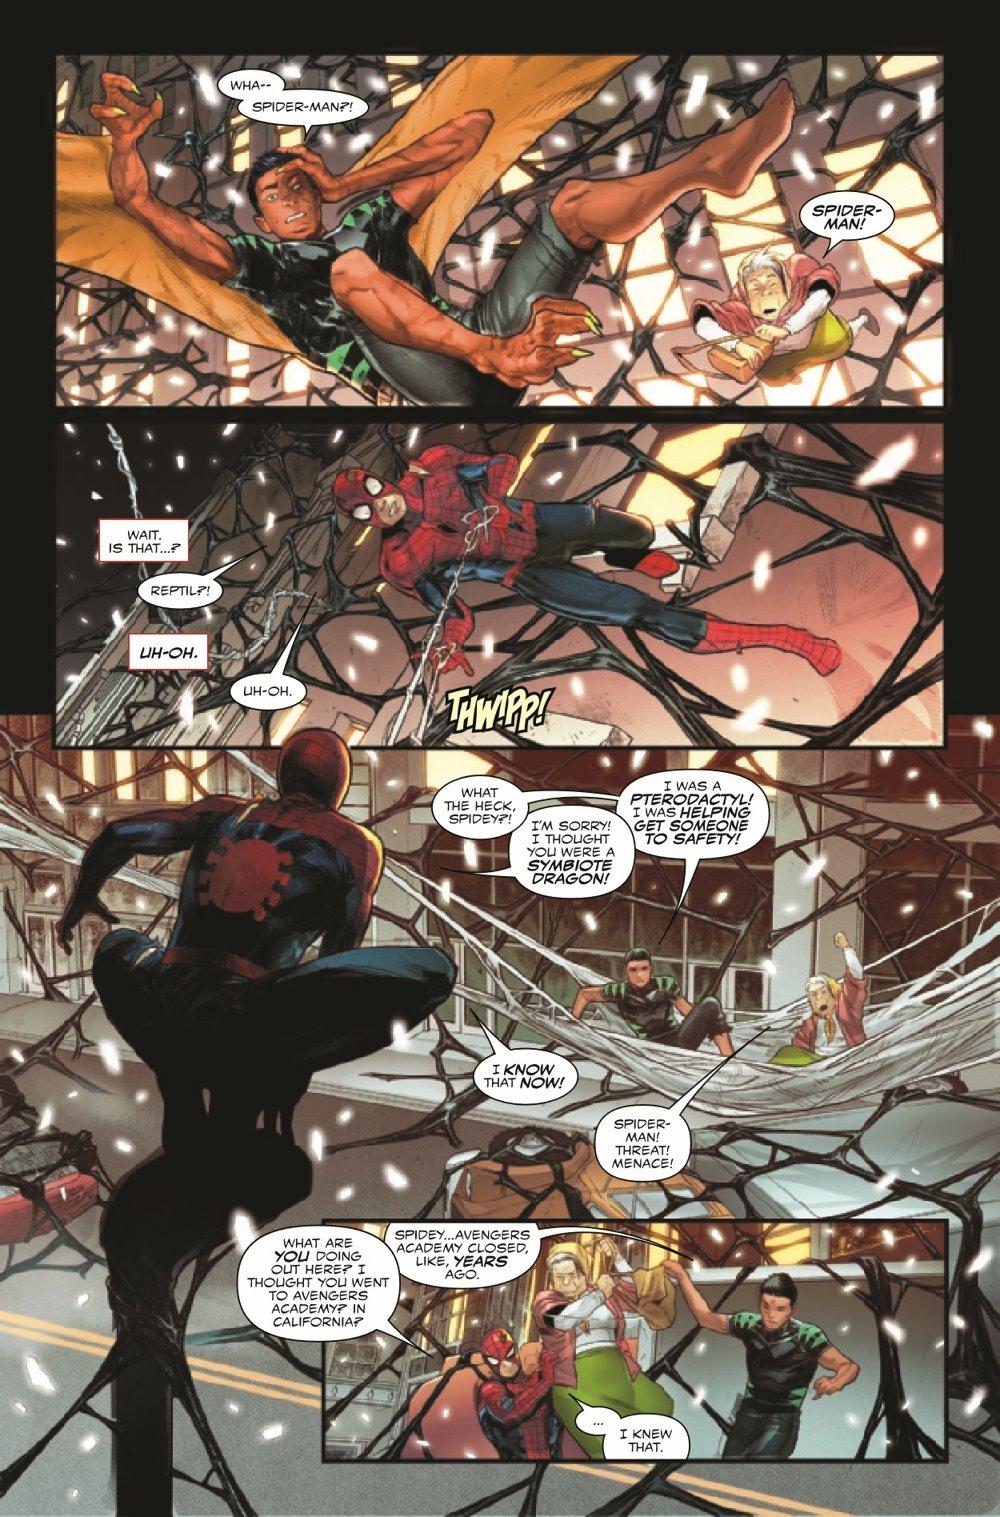 SMKIB2021001_Preview-7 ComicList Previews: KING IN BLACK SPIDER-MAN #1